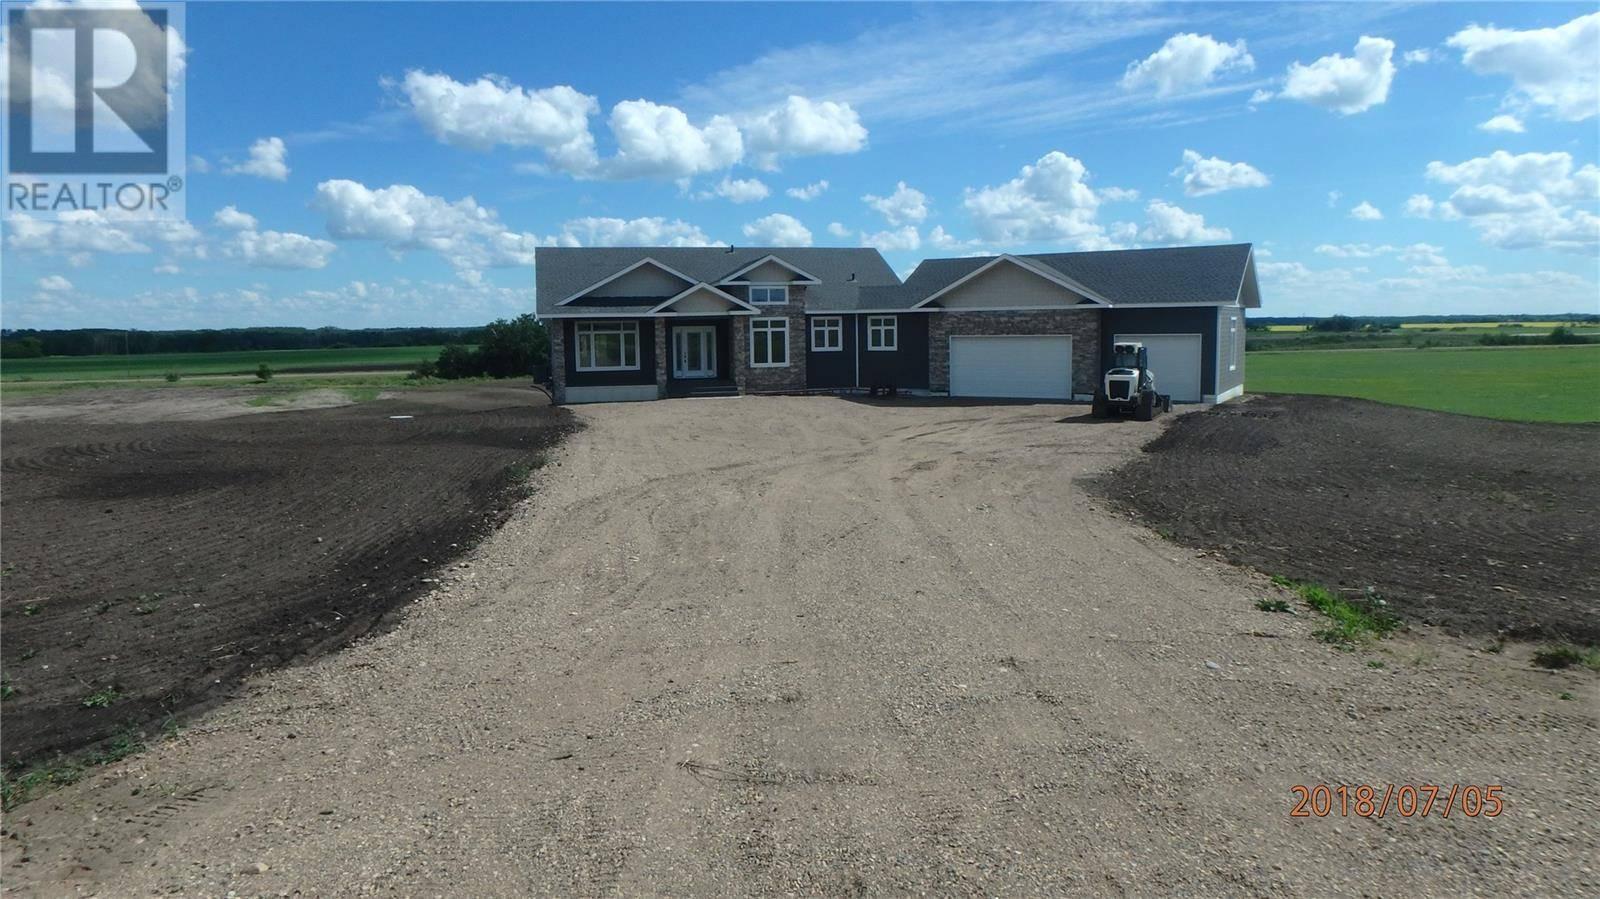 House for sale at 3 Lot Block Estates Unit 4 Buckland Rm No. 491 Saskatchewan - MLS: SK771128